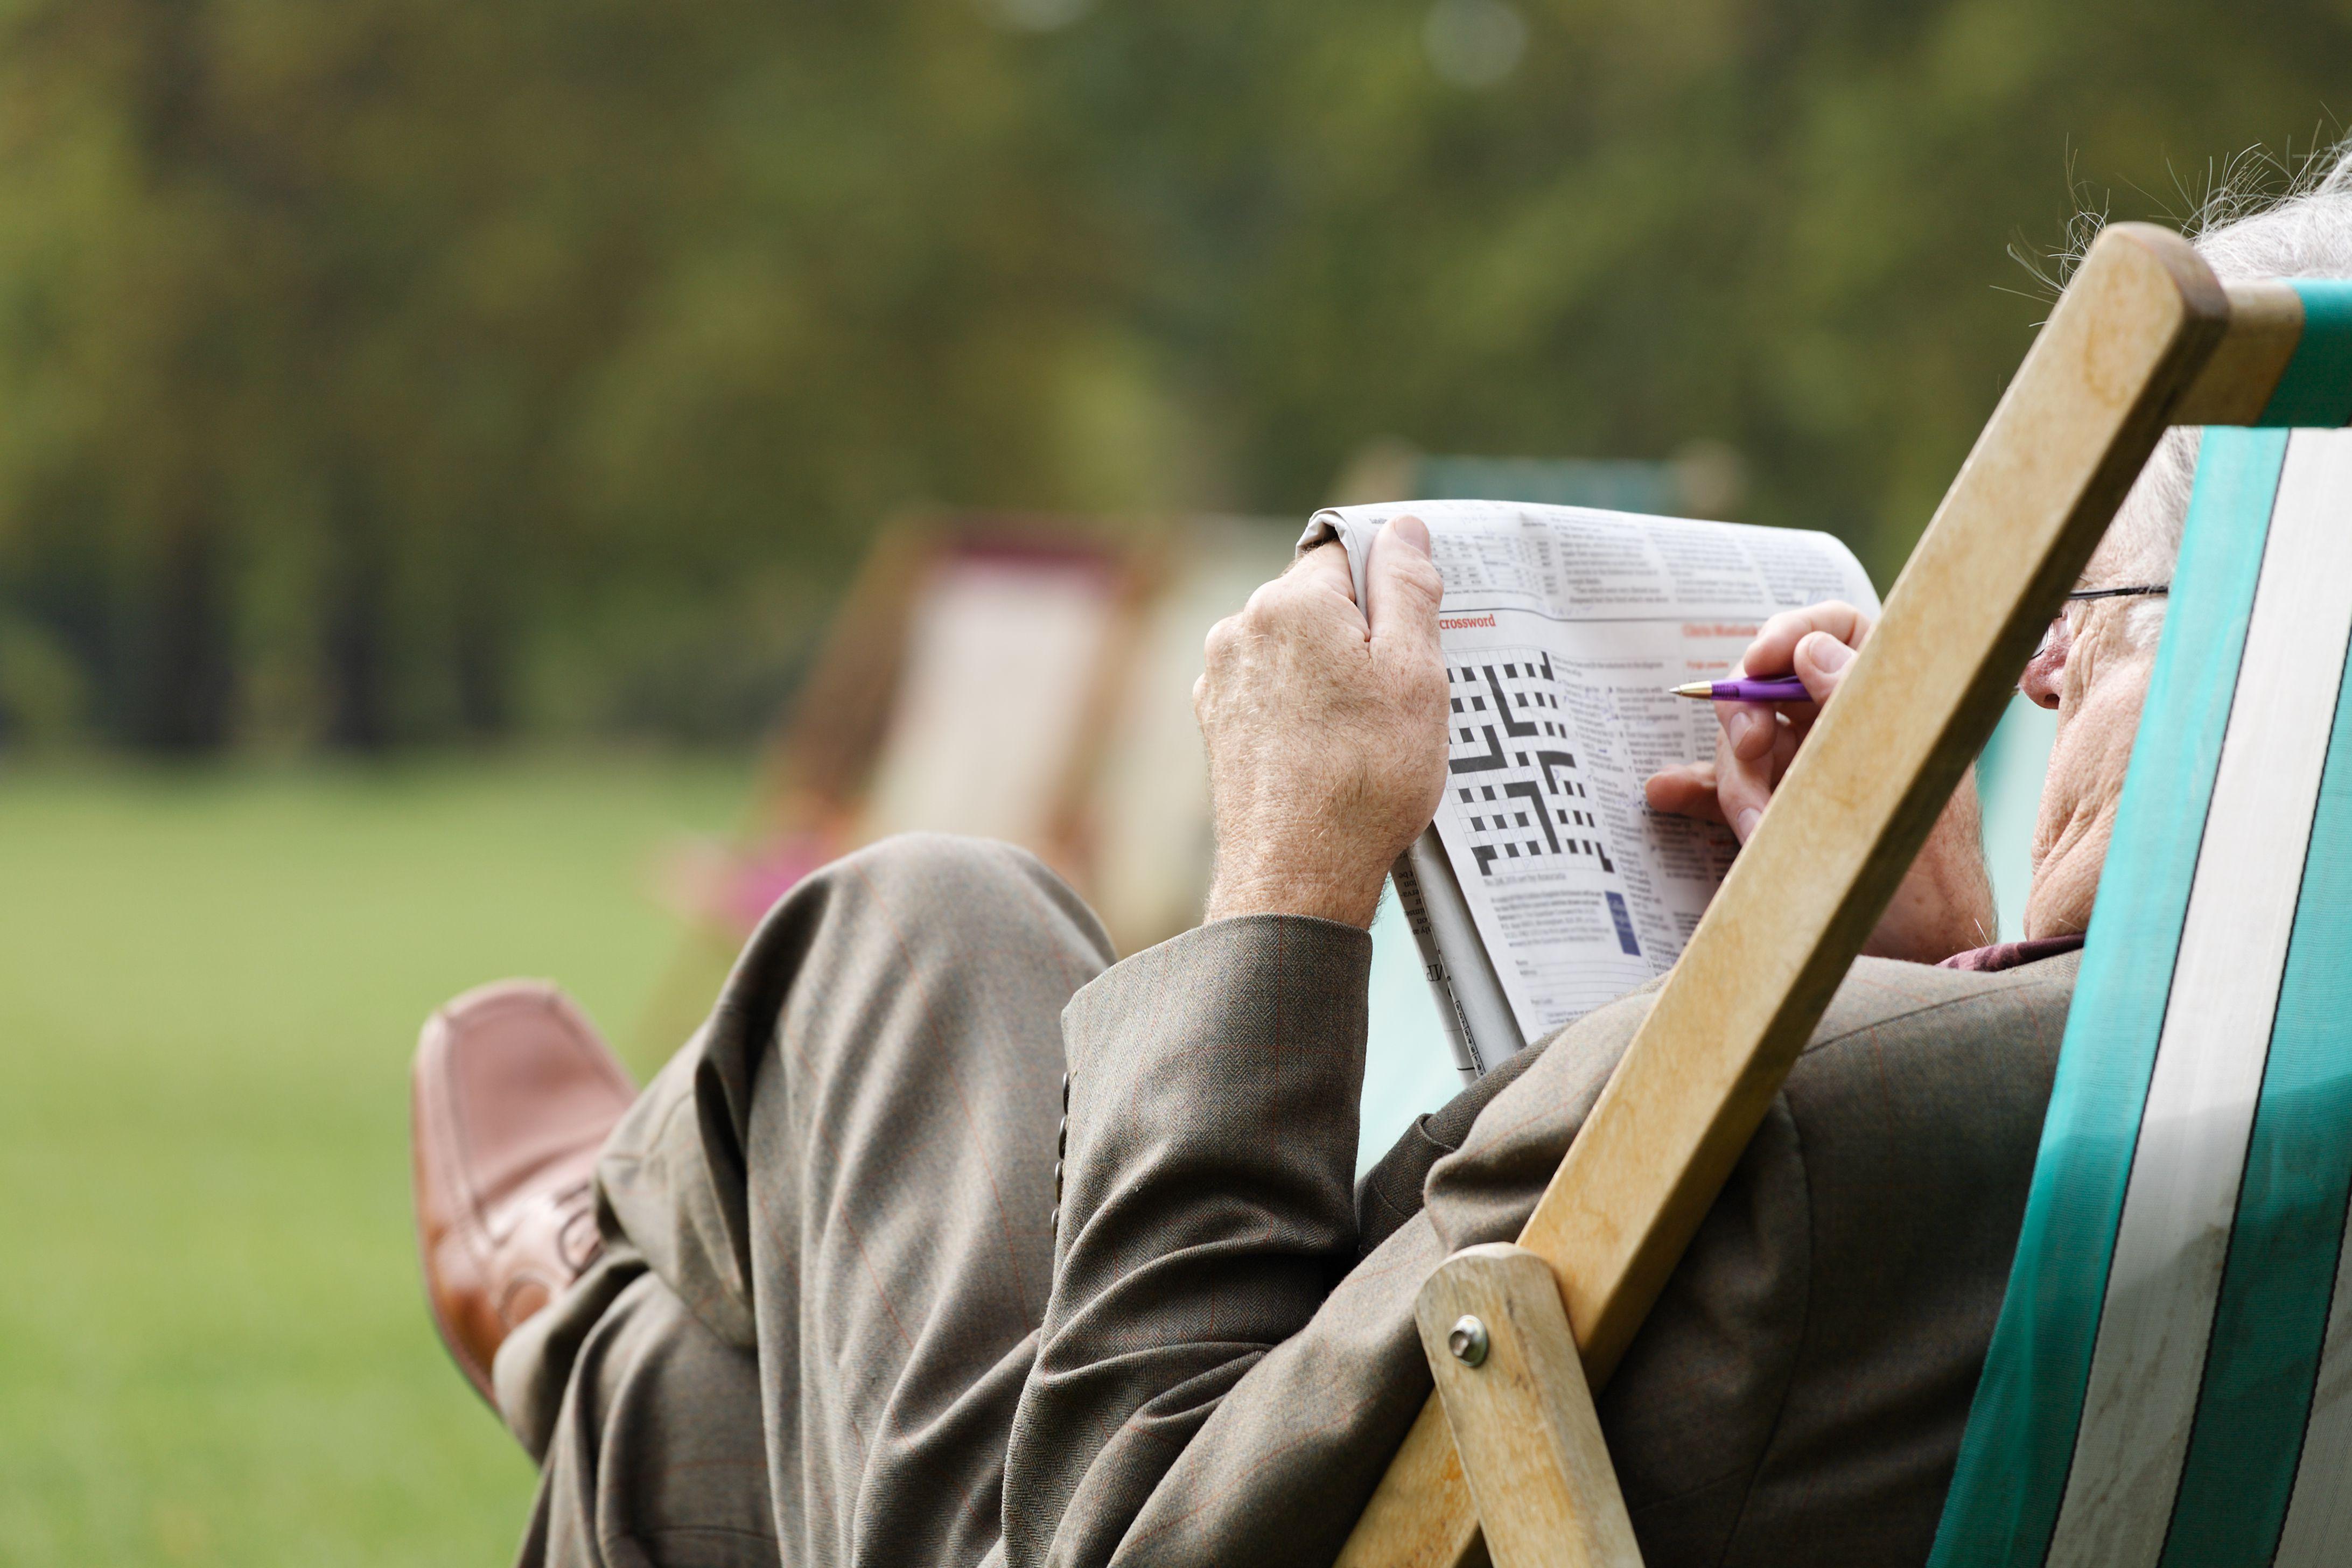 Elderly man sitting in deckchair outside doing crossword